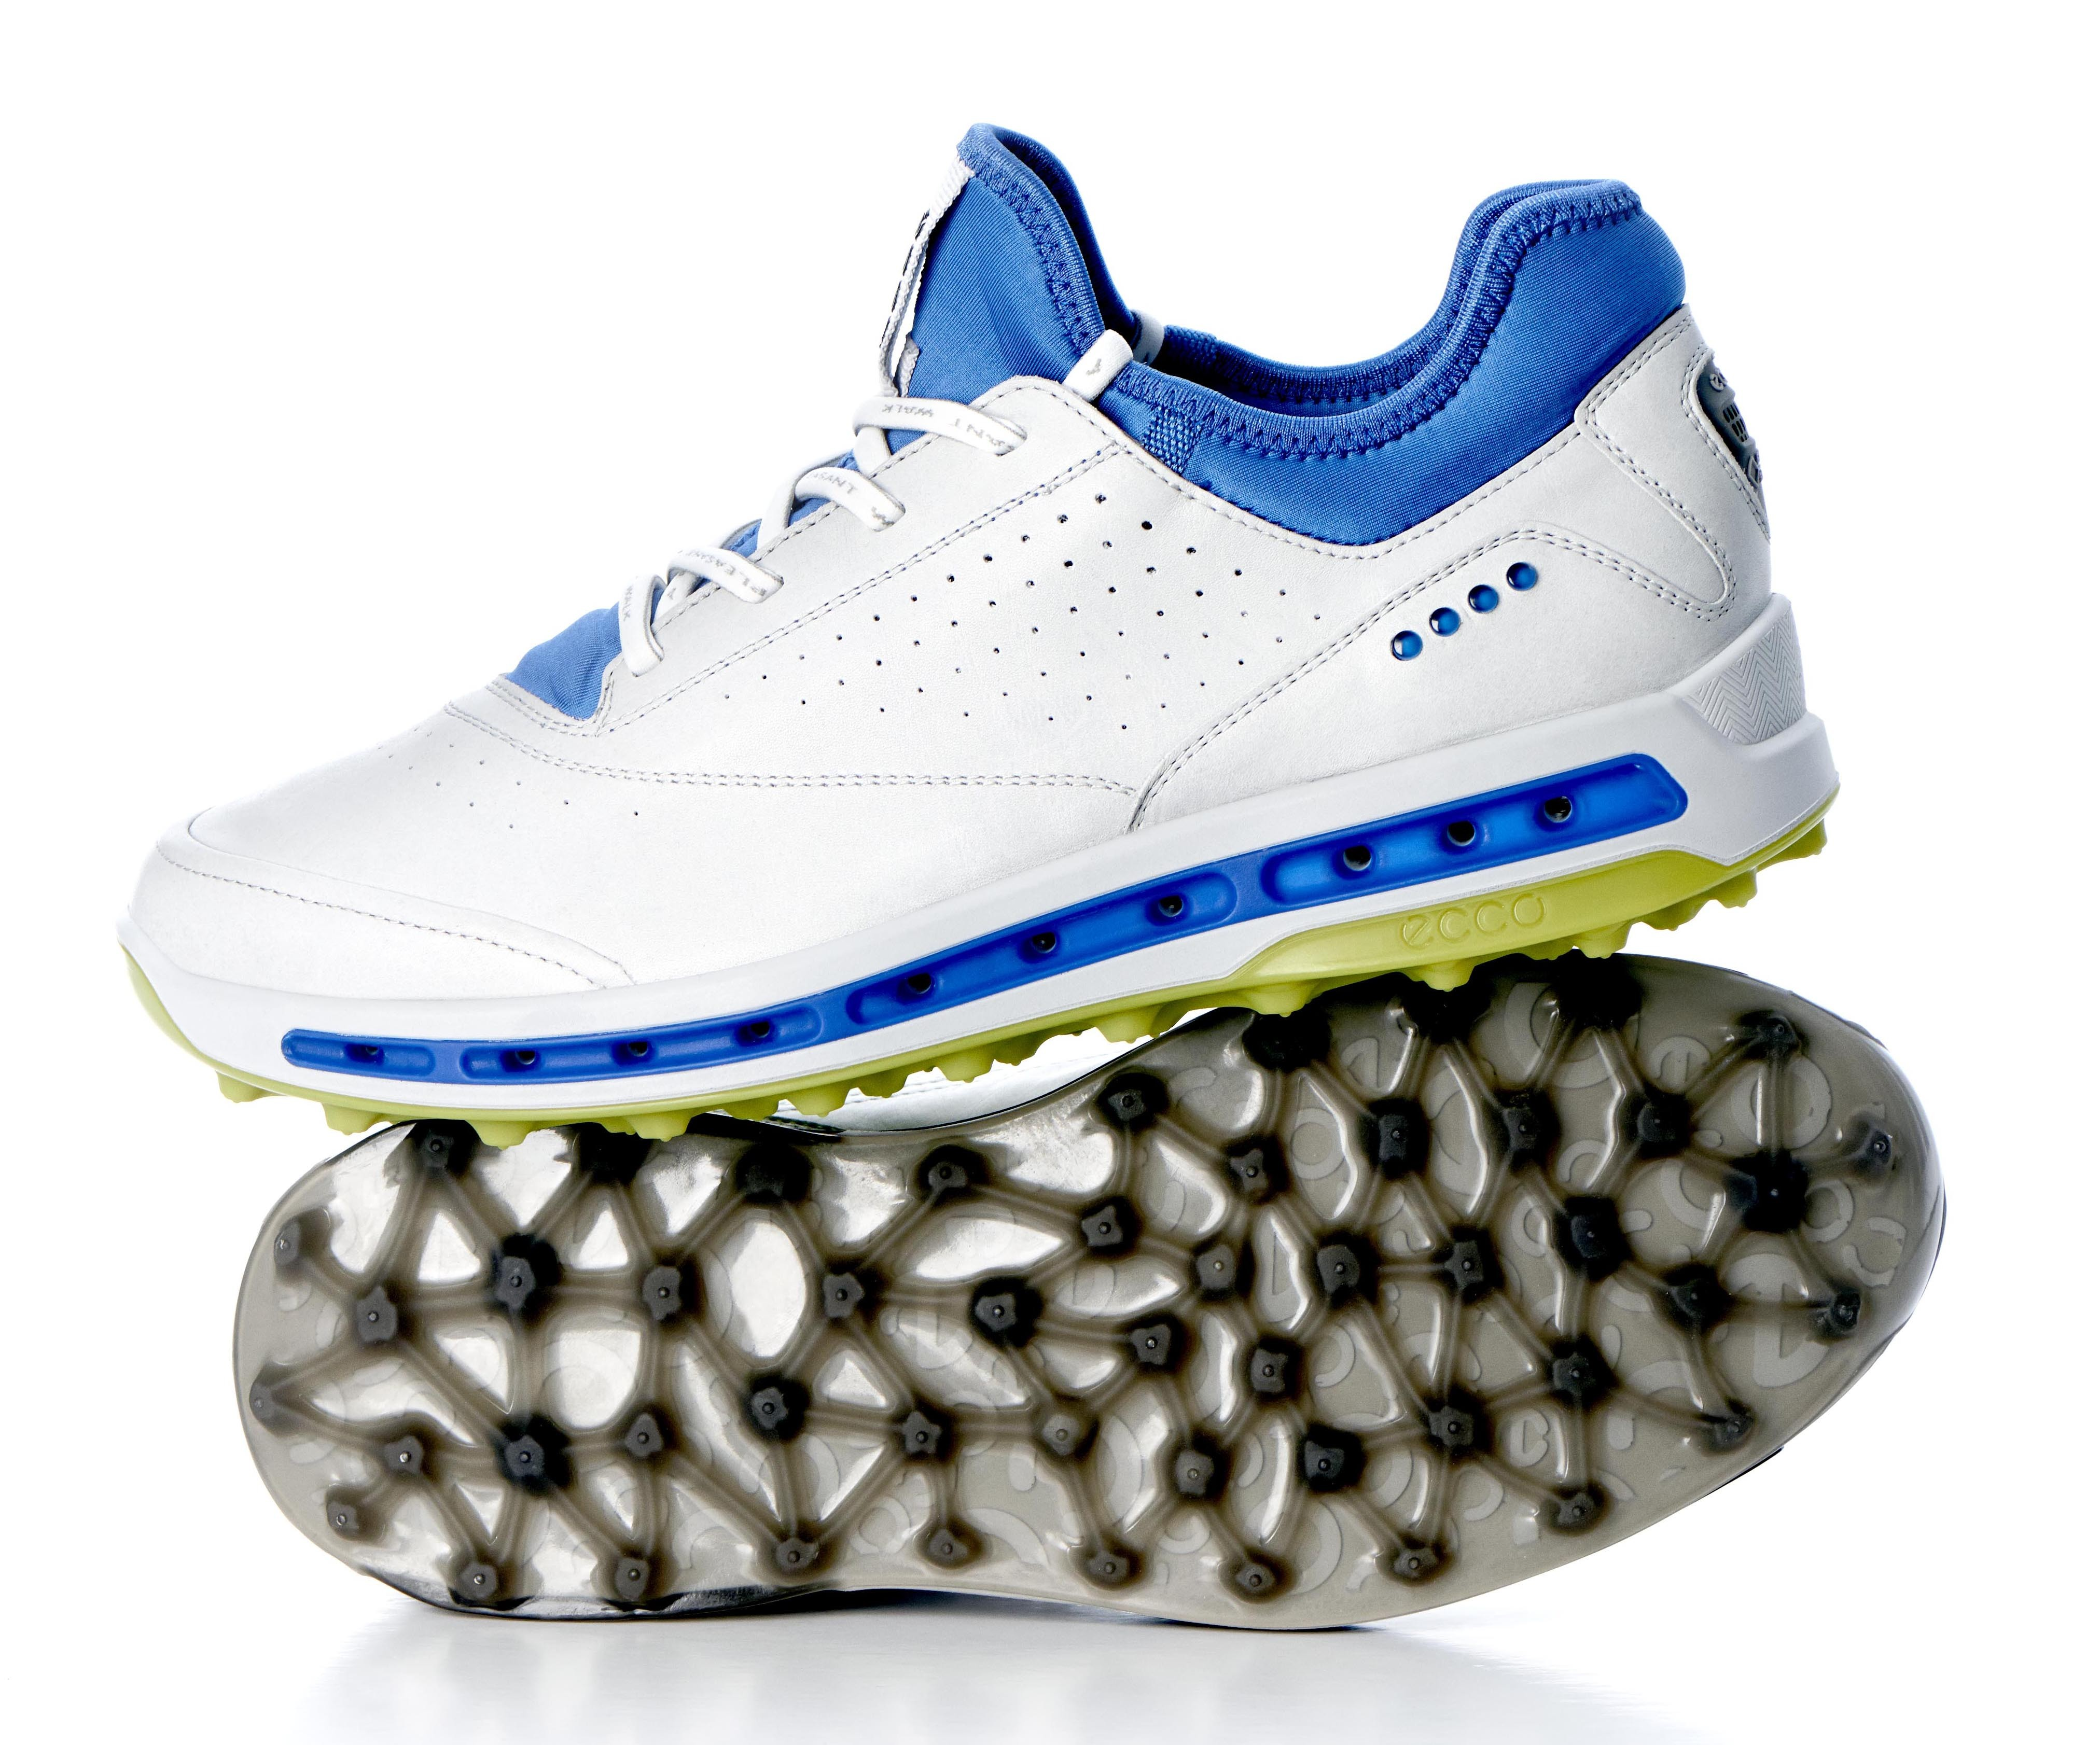 Ecco Cool Pro boordevol technologie | Golfersmagazine